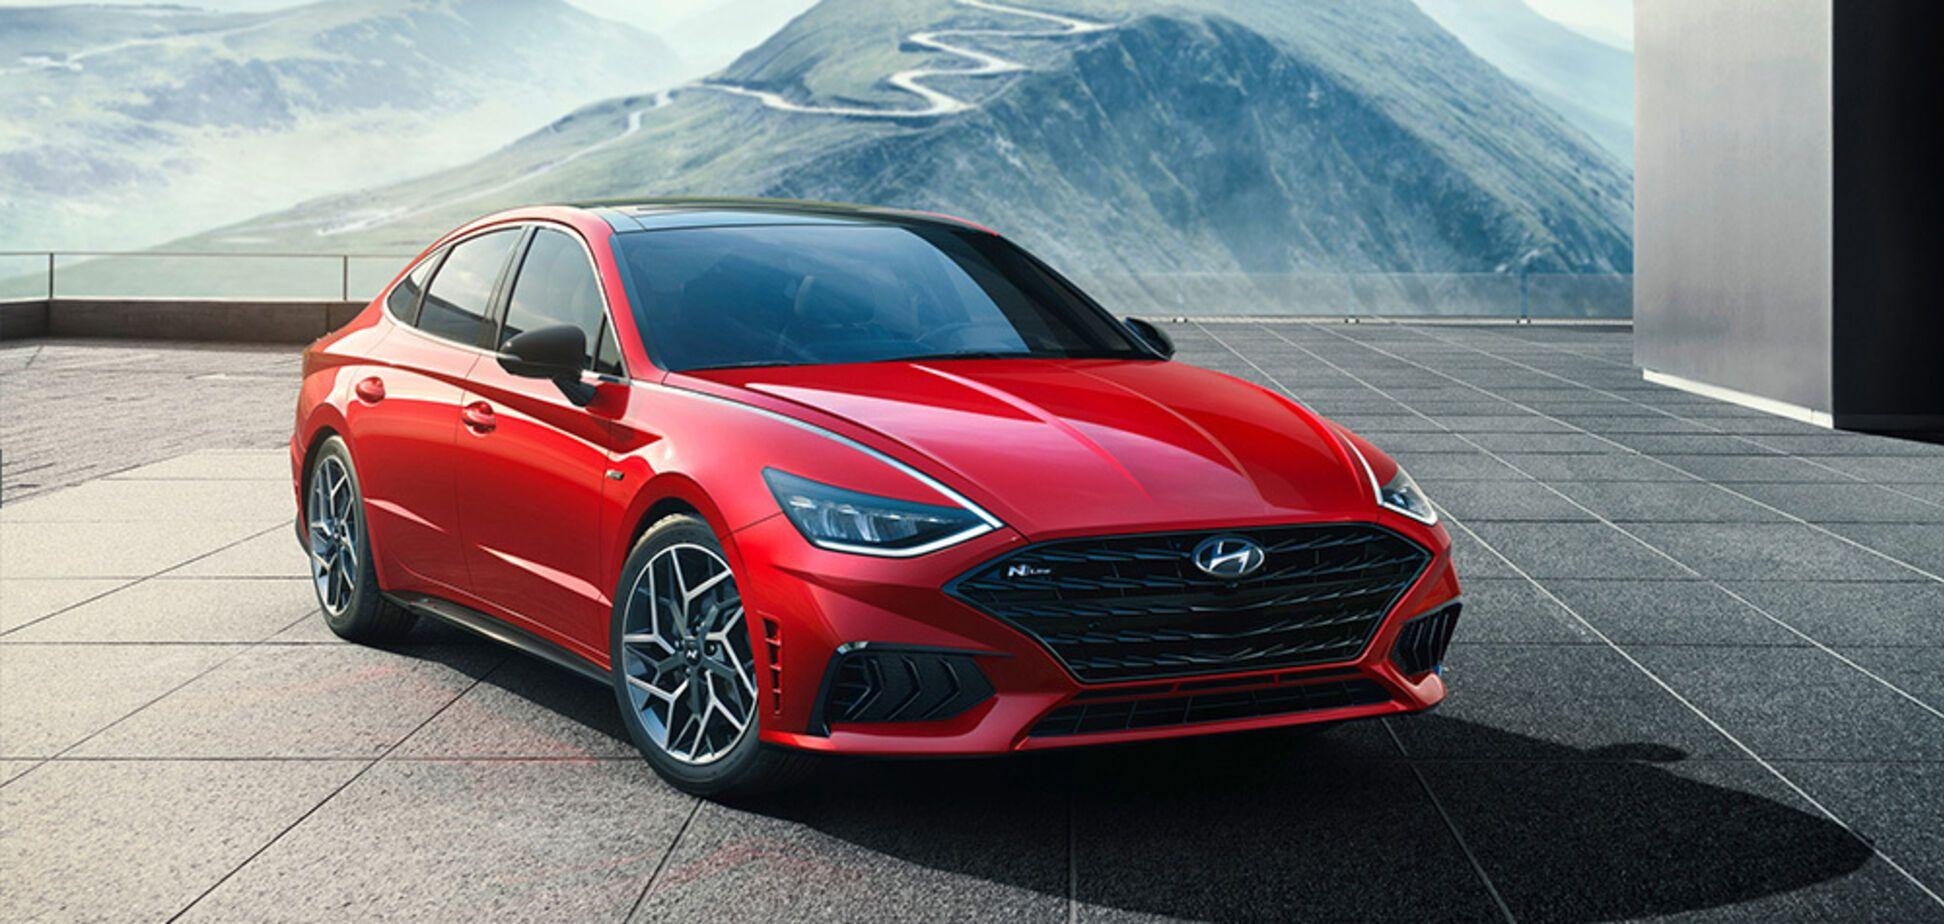 Hyundai презентовал спортивную версию Sonata N Line